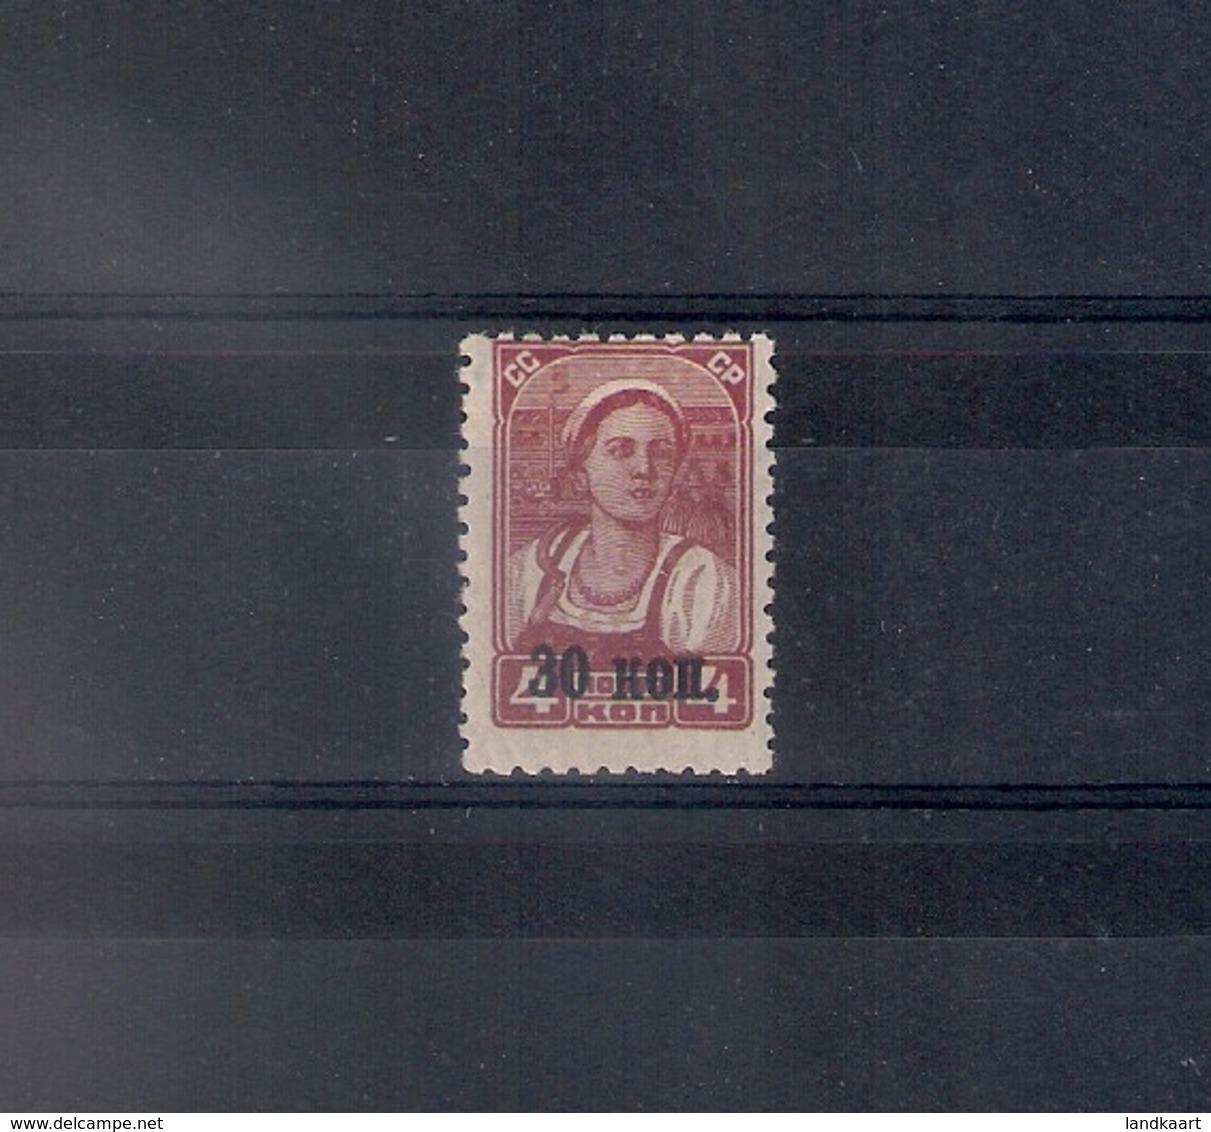 Russia 1939, Michel Nr 698Z, No Watermark, MLH OG - Ongebruikt